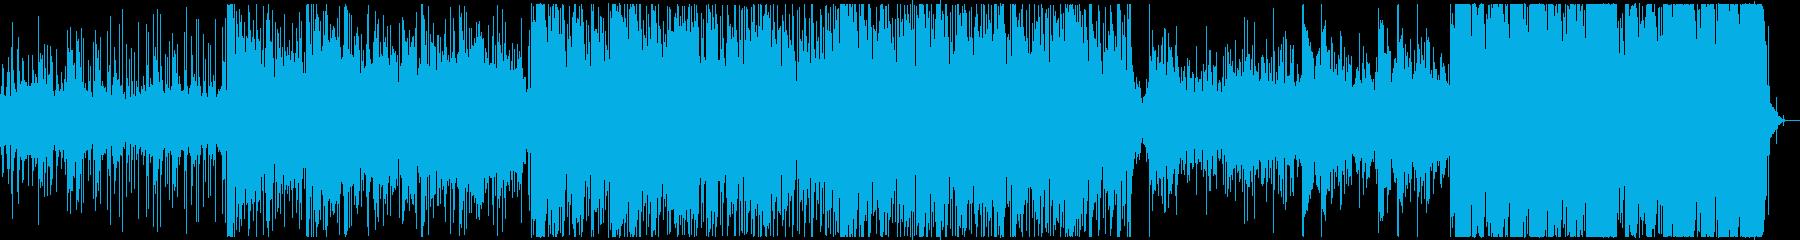 T.V.ハッピー広告テーマインスト...の再生済みの波形